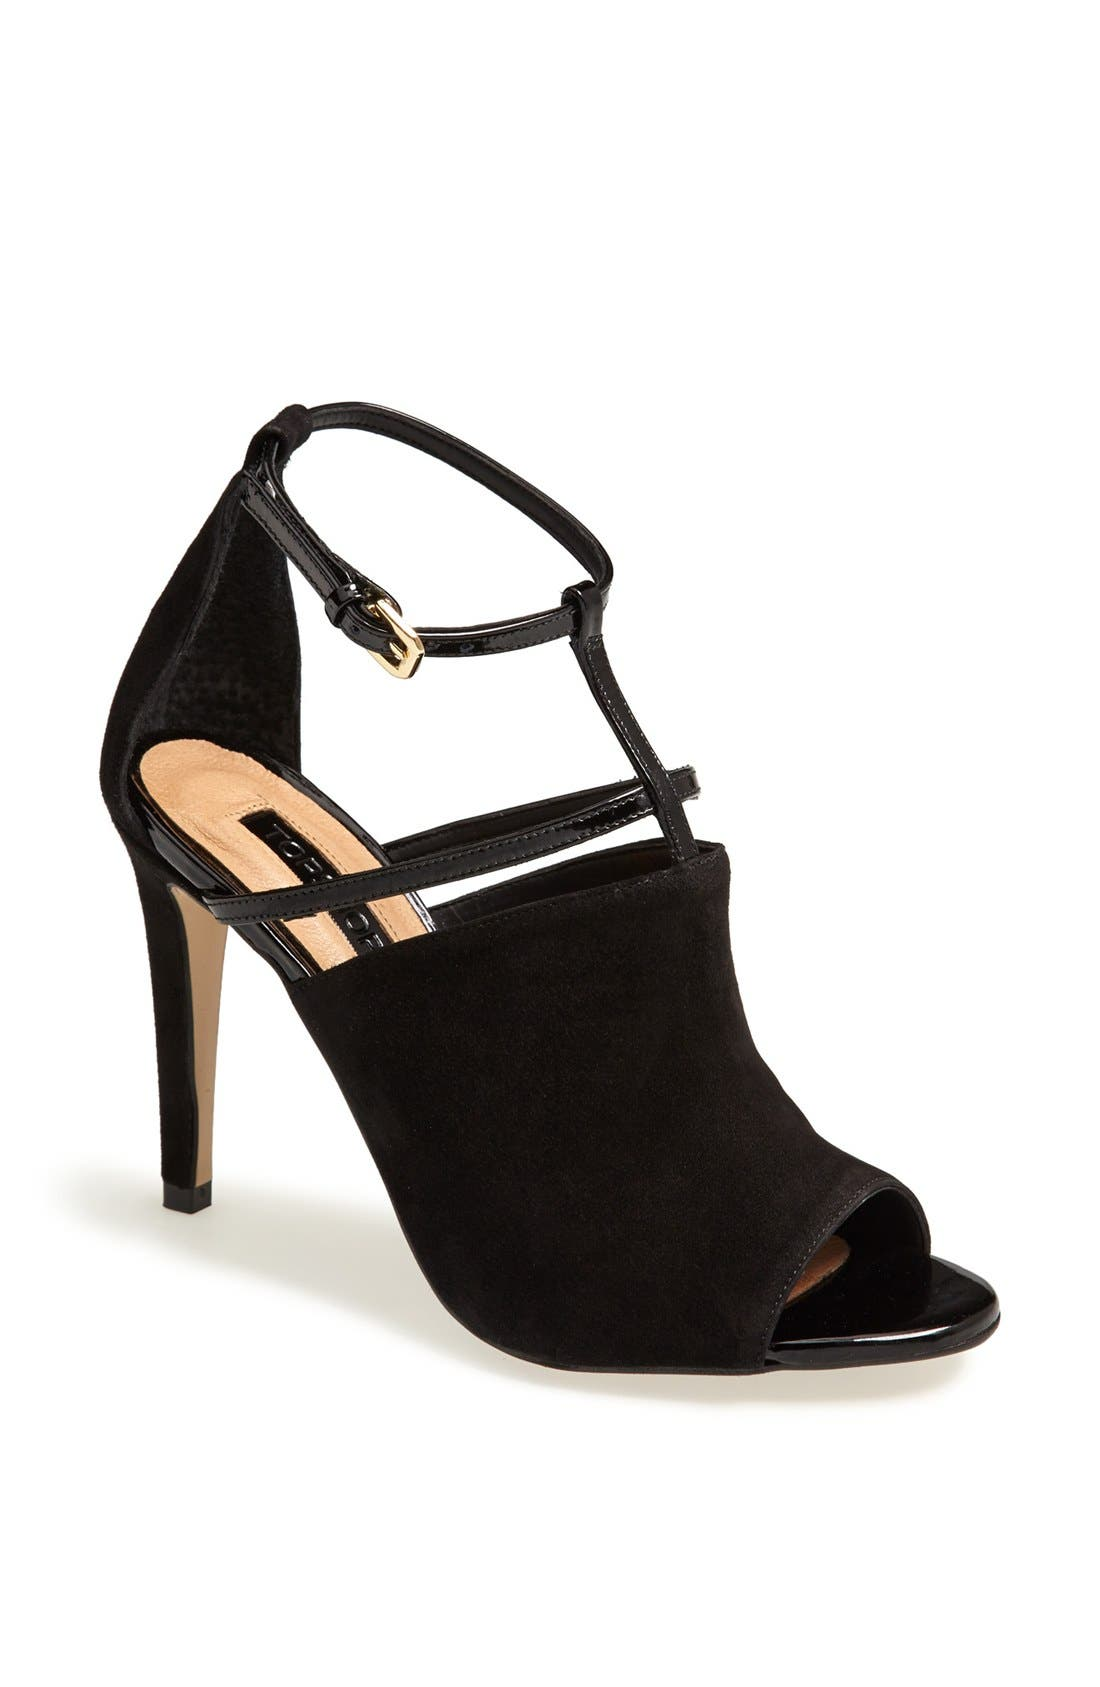 Alternate Image 1 Selected - Topshop 'Gamos' Leather Sandal